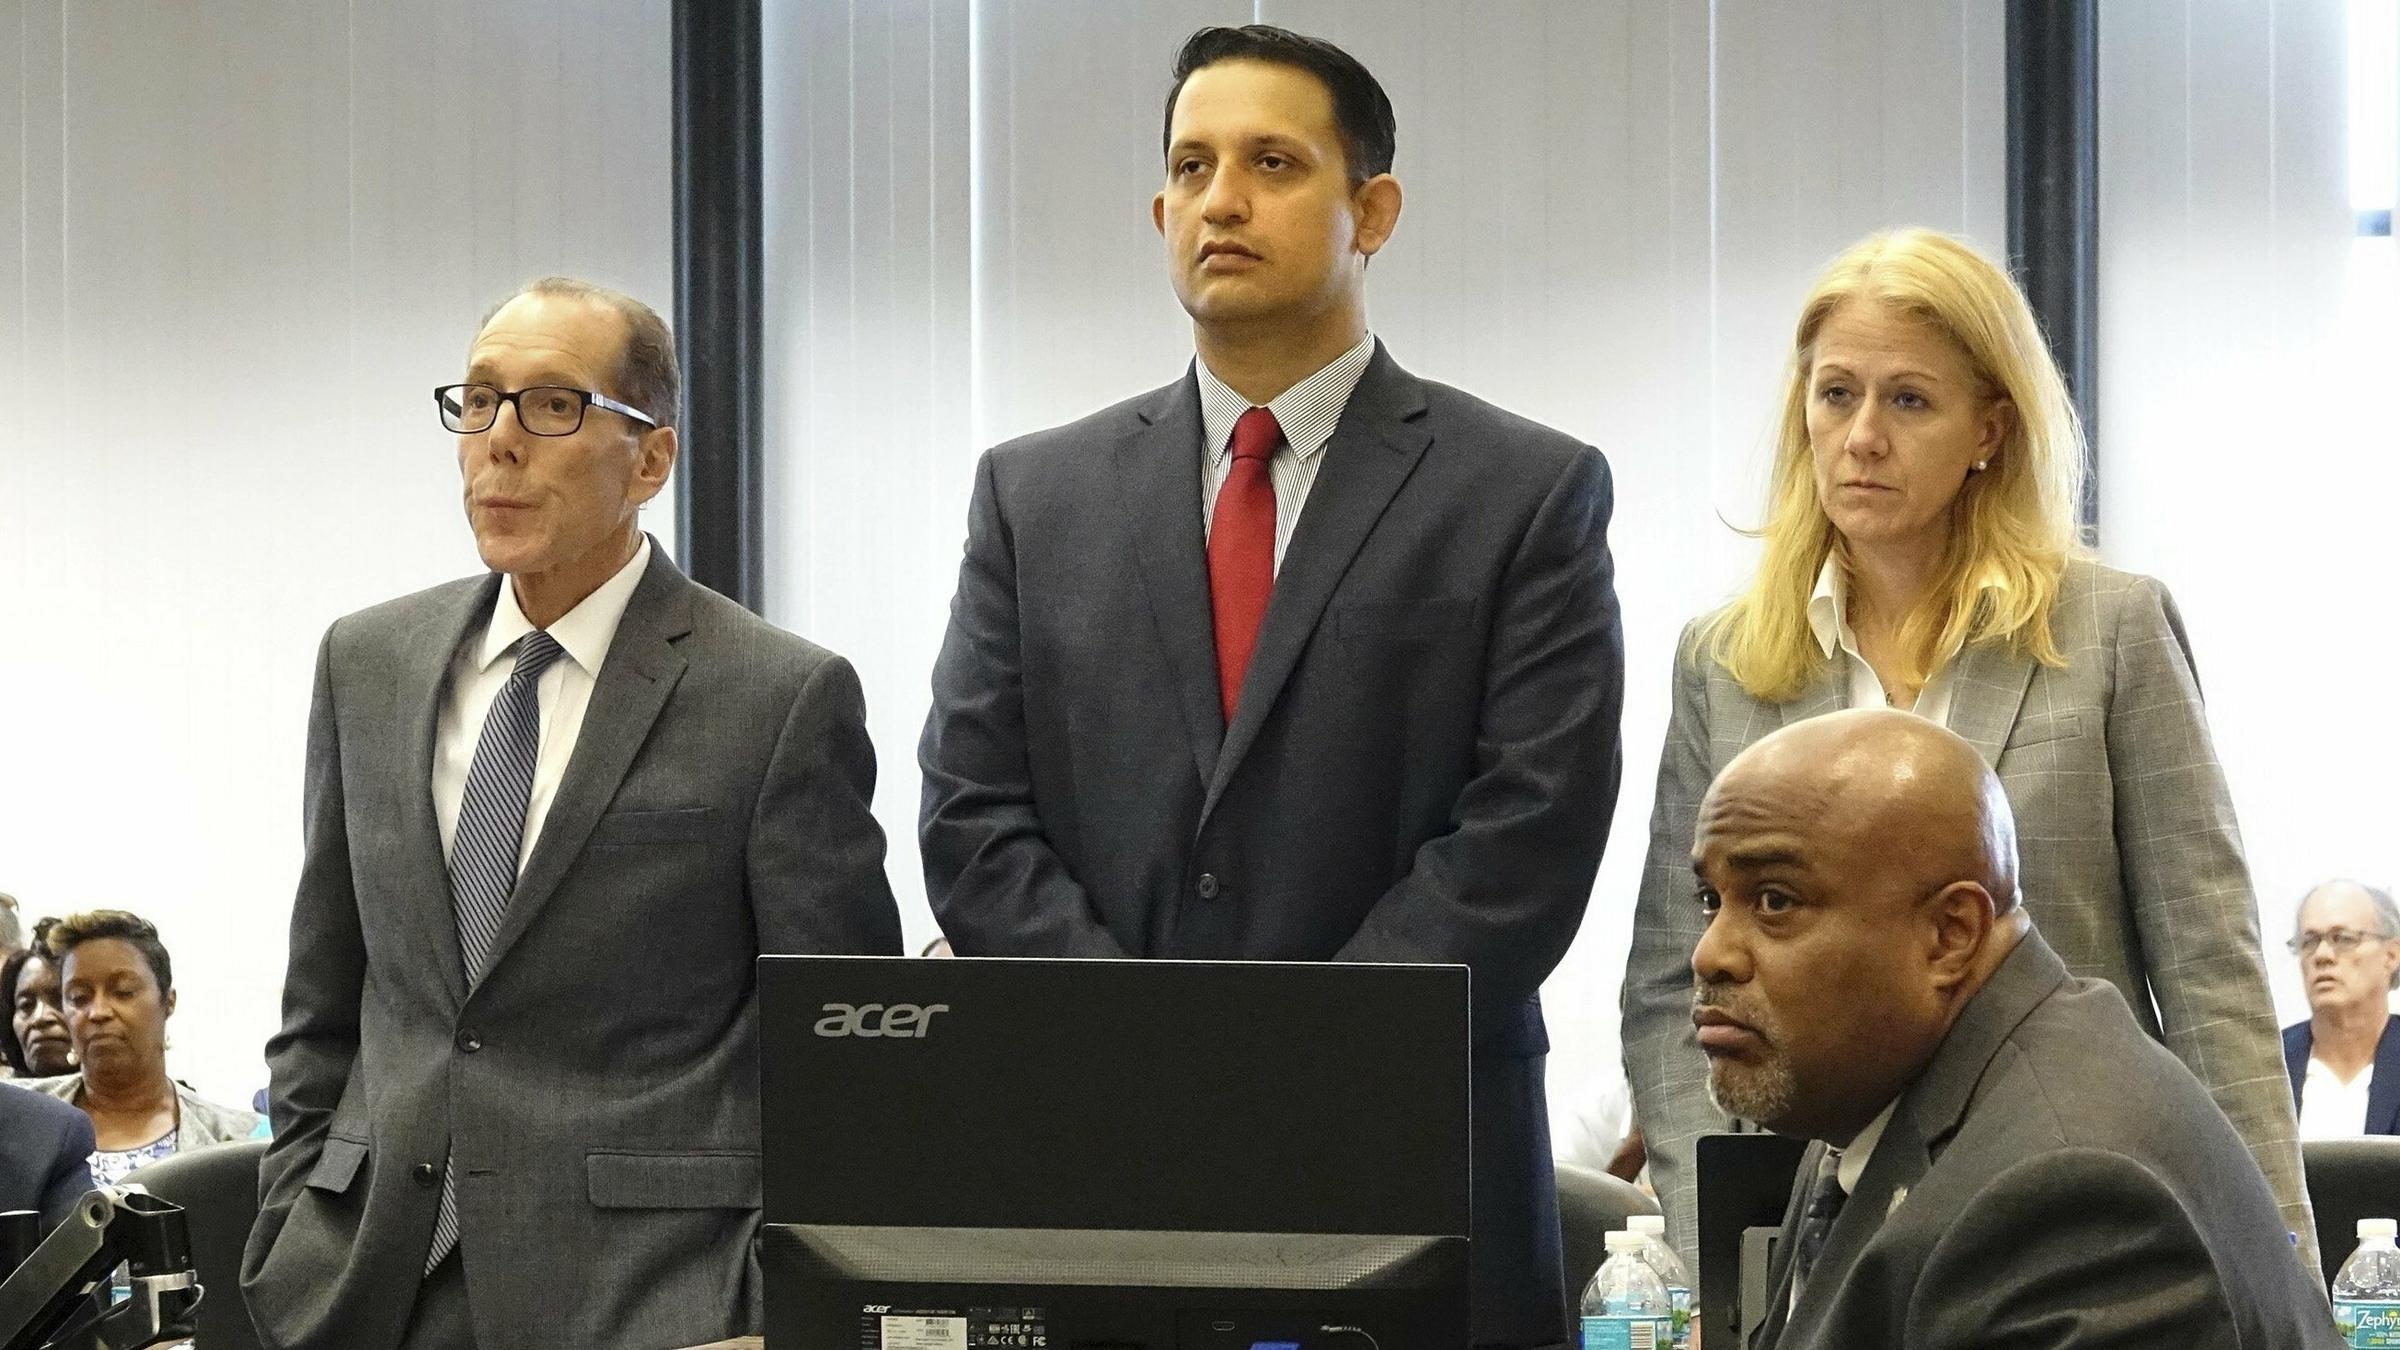 Former Florida officer found guilty of slaying black motorist